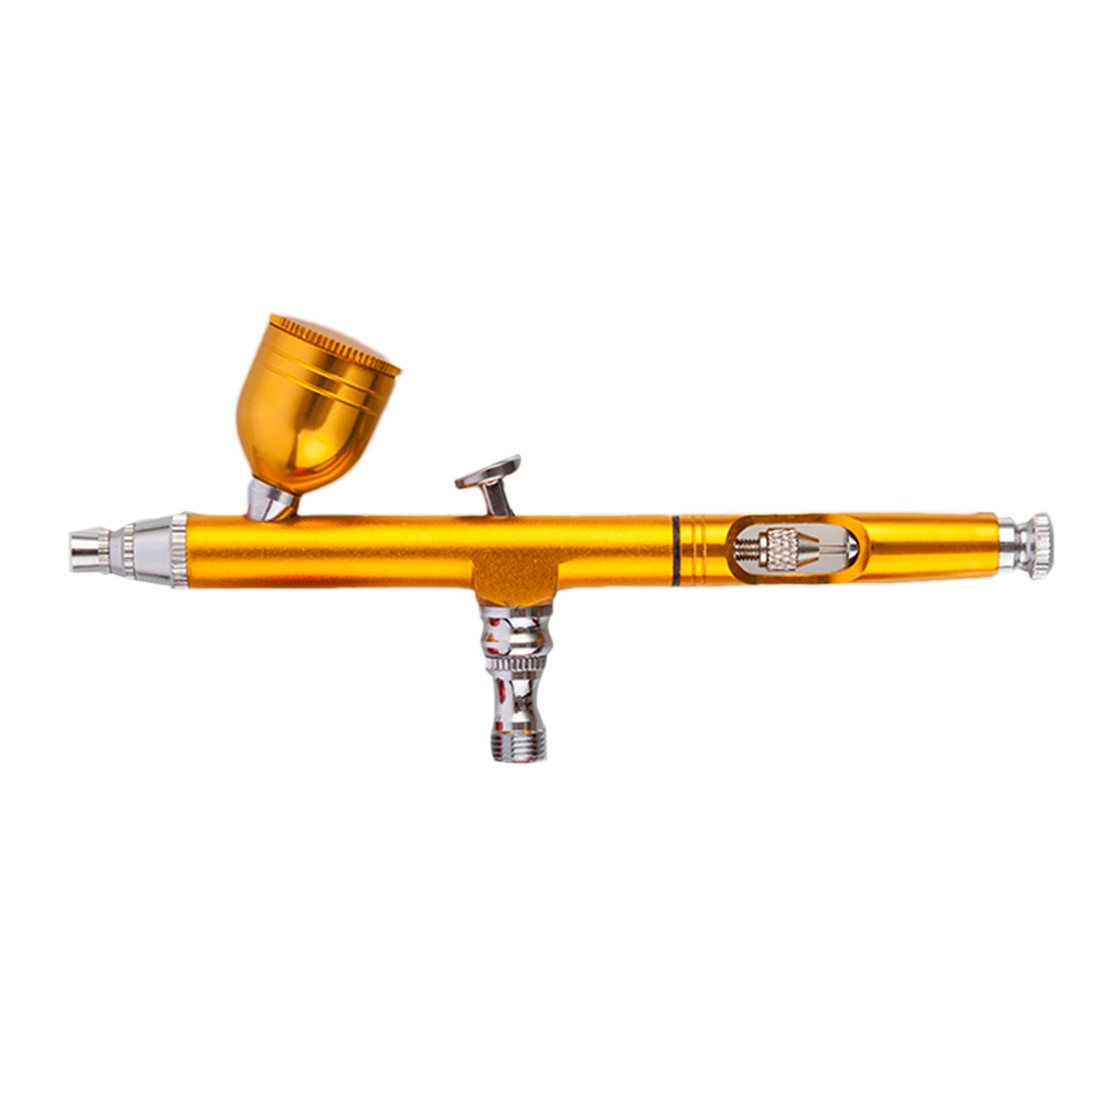 AR130 Mini Kit de aerógrafo, pluma de aerógrafo, herramienta de pulverizador para modelo de maquillaje, estampado de tatuajes, amarillo